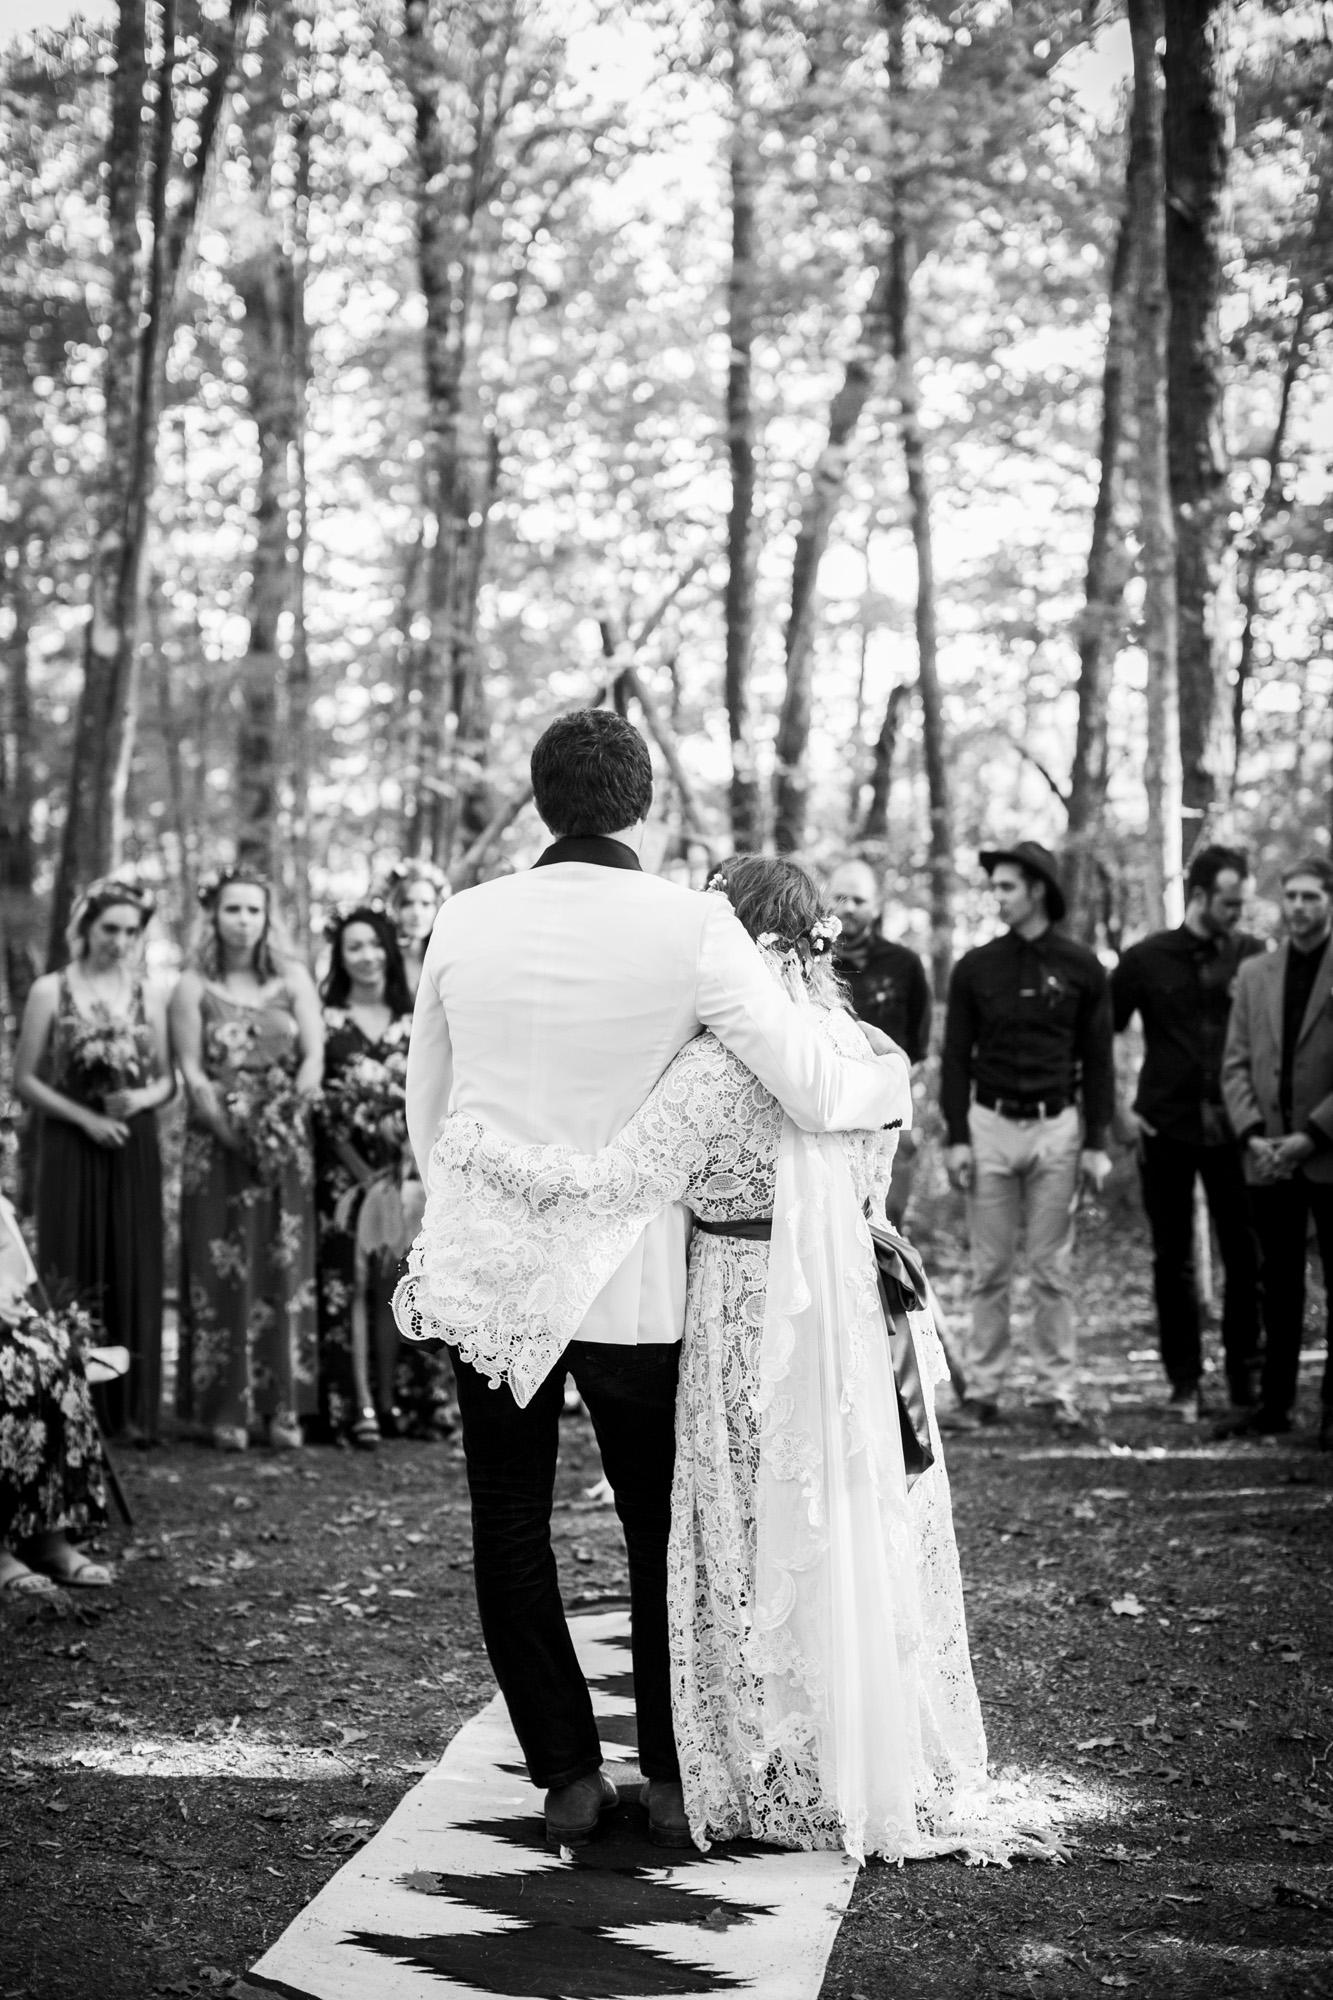 Seriously_Sabrina_Photography_Red_River_Gorge_Kentucky_Wedding_ShawnDana131.jpg